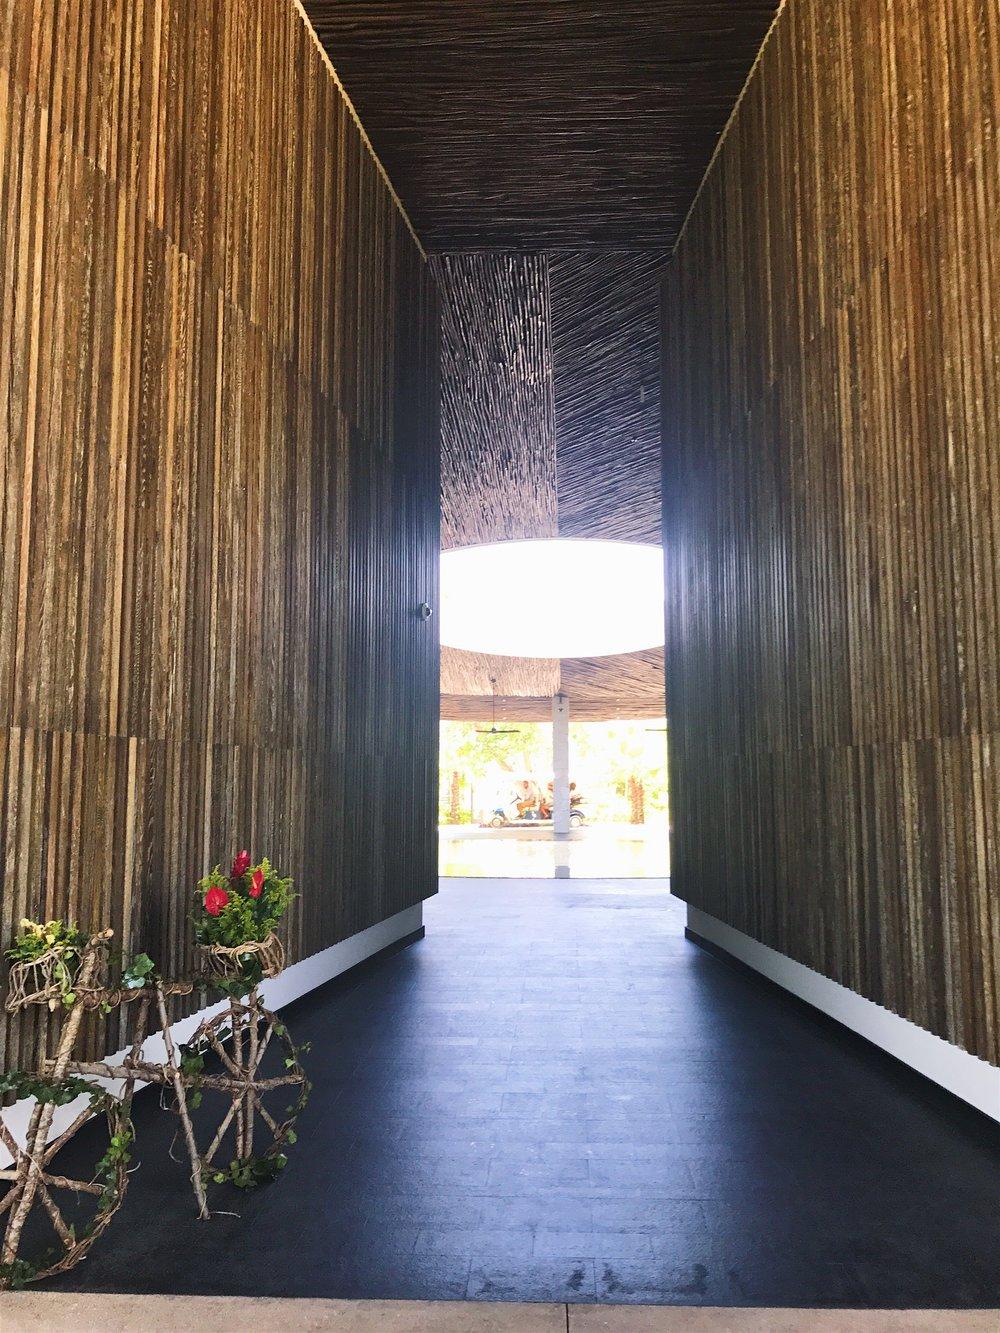 Entrance of the Andaz Mayakoba